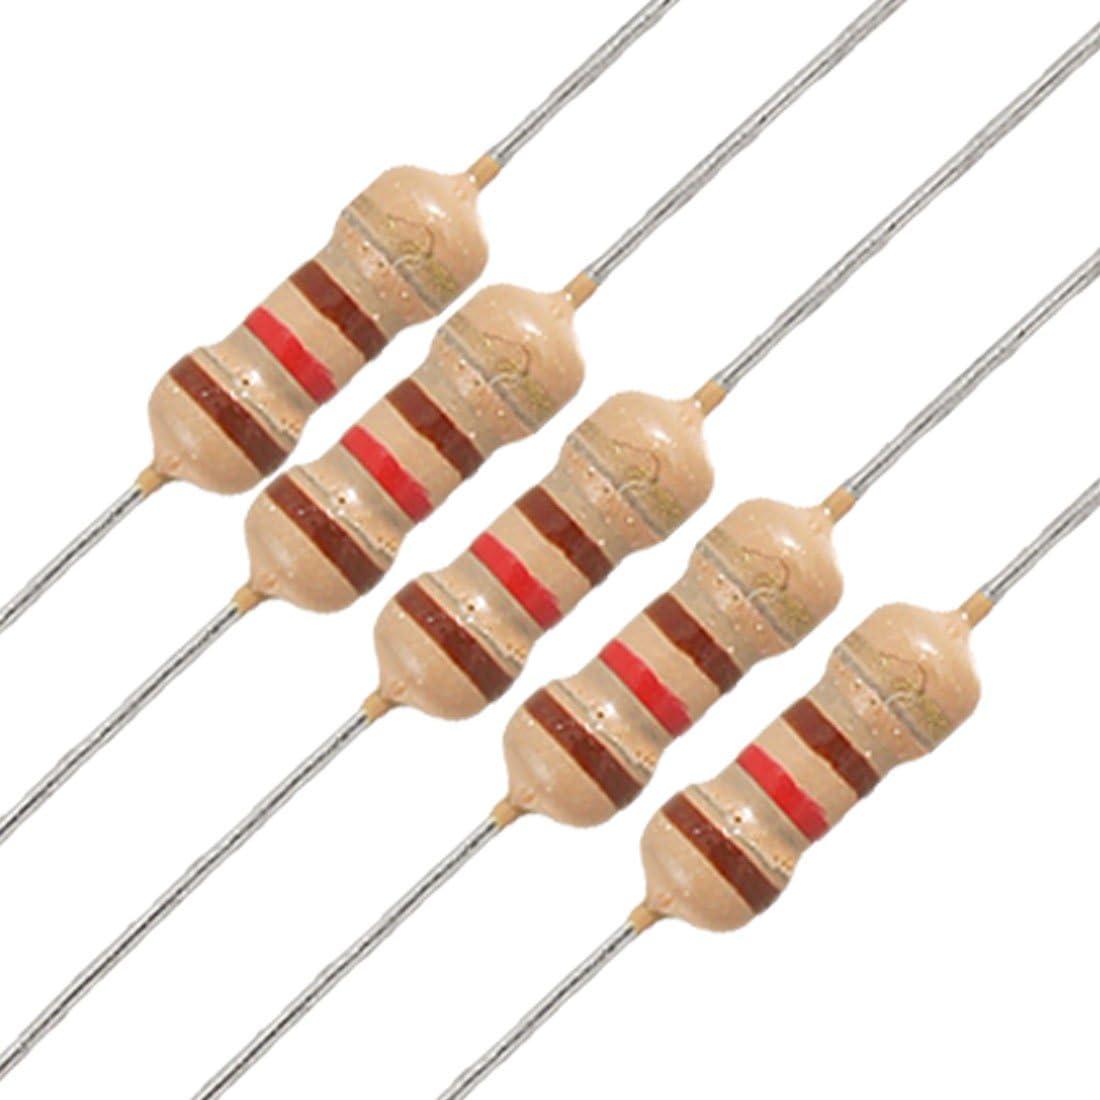 LOT OF 50 5.6 Ohm 2W Carbon Film Resistor